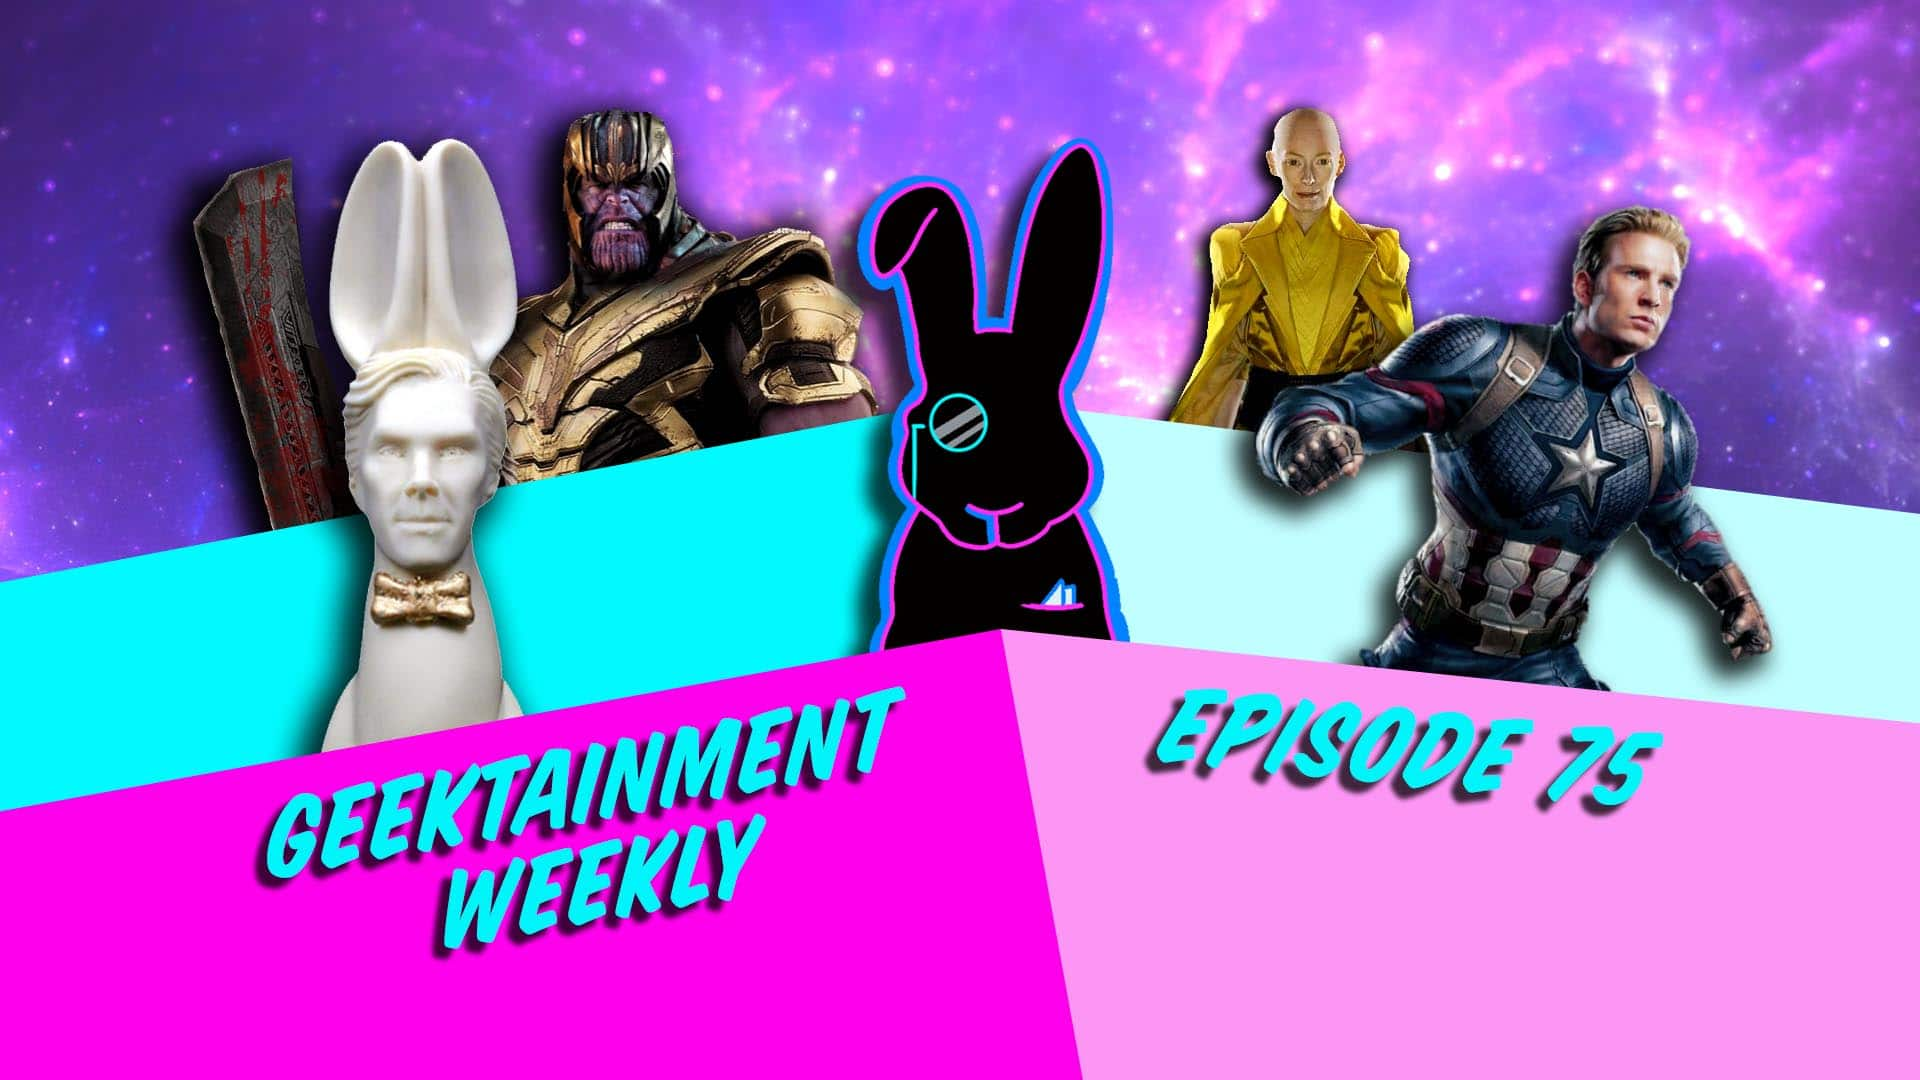 Geektainment Weekly - Episode 75